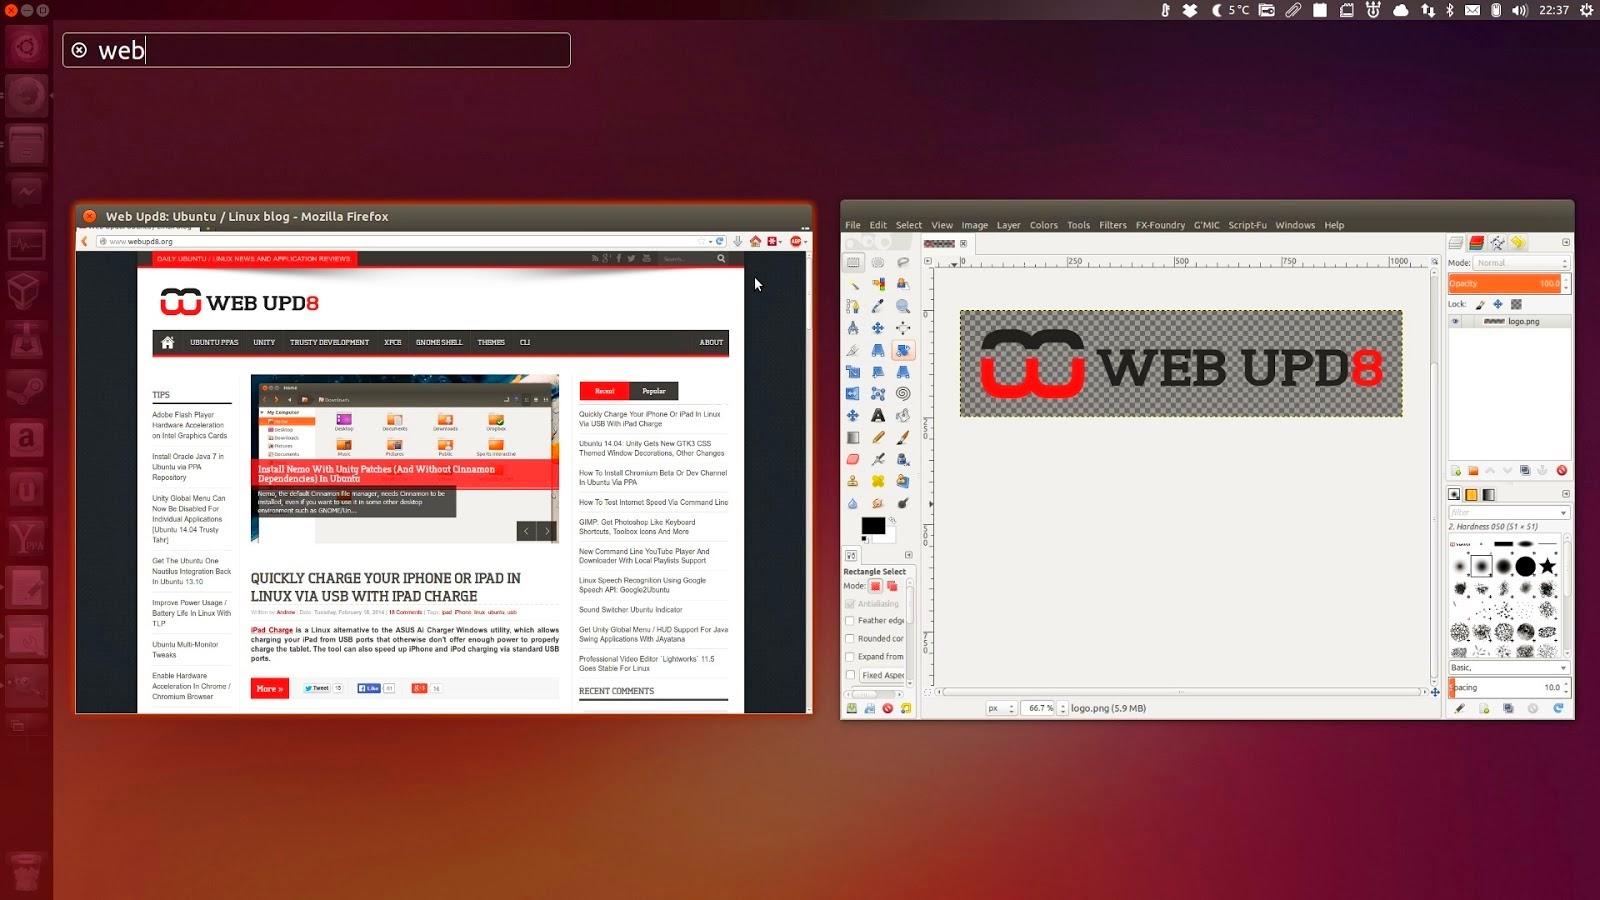 Google themes ubuntu 14.04 - Ubuntu 14 04 Screenshots